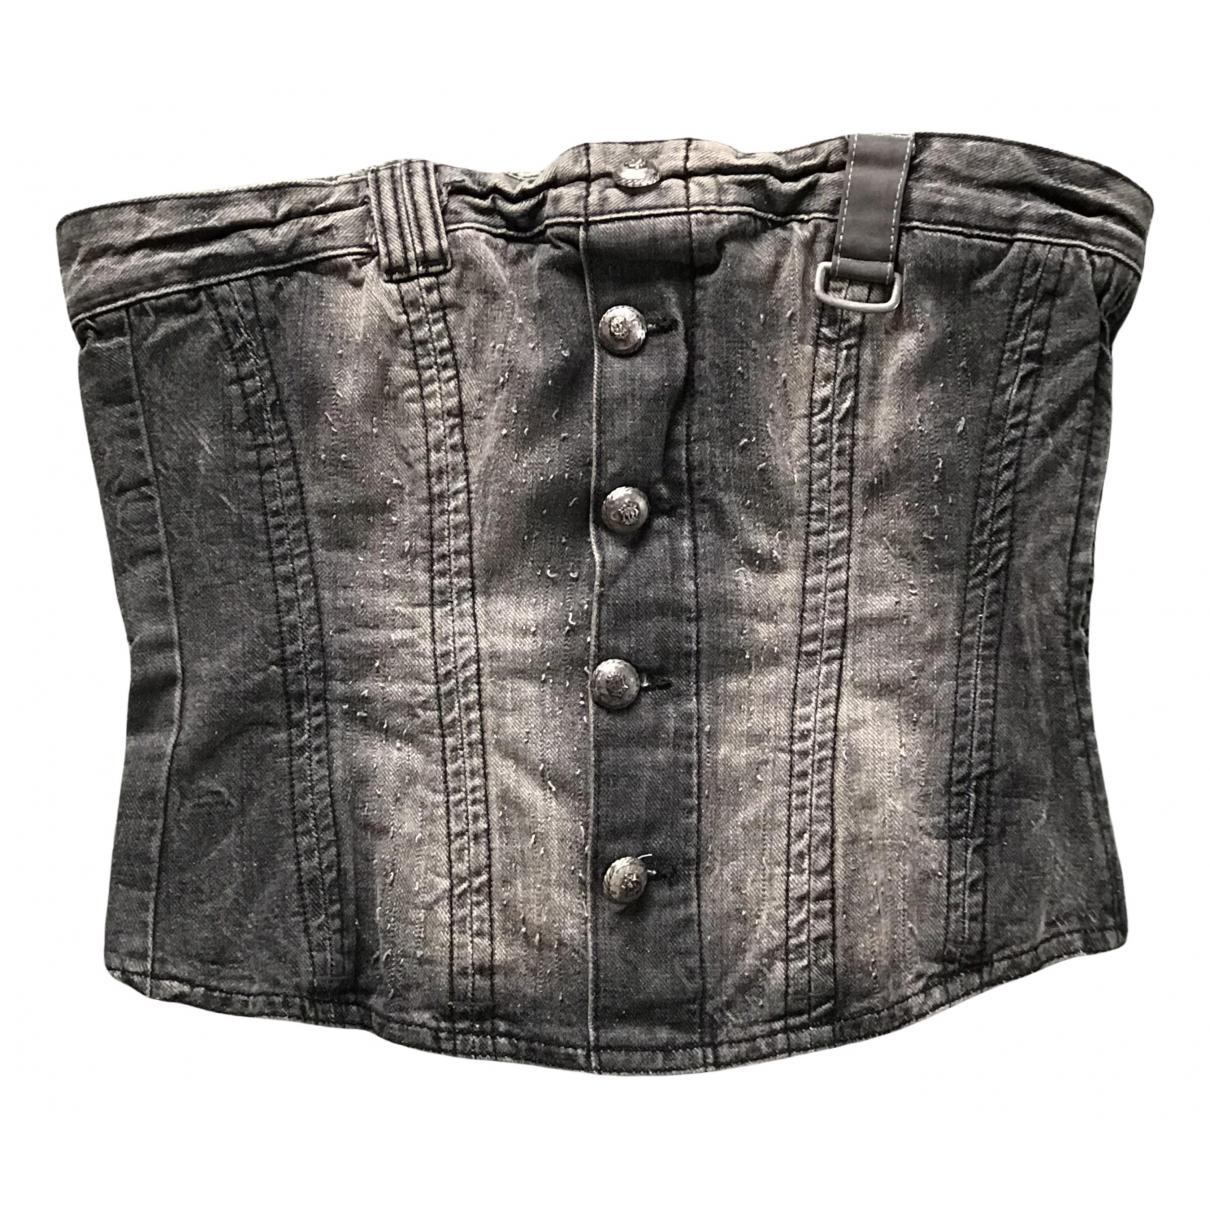 Gestuz \N Grey Denim - Jeans  top for Women S International